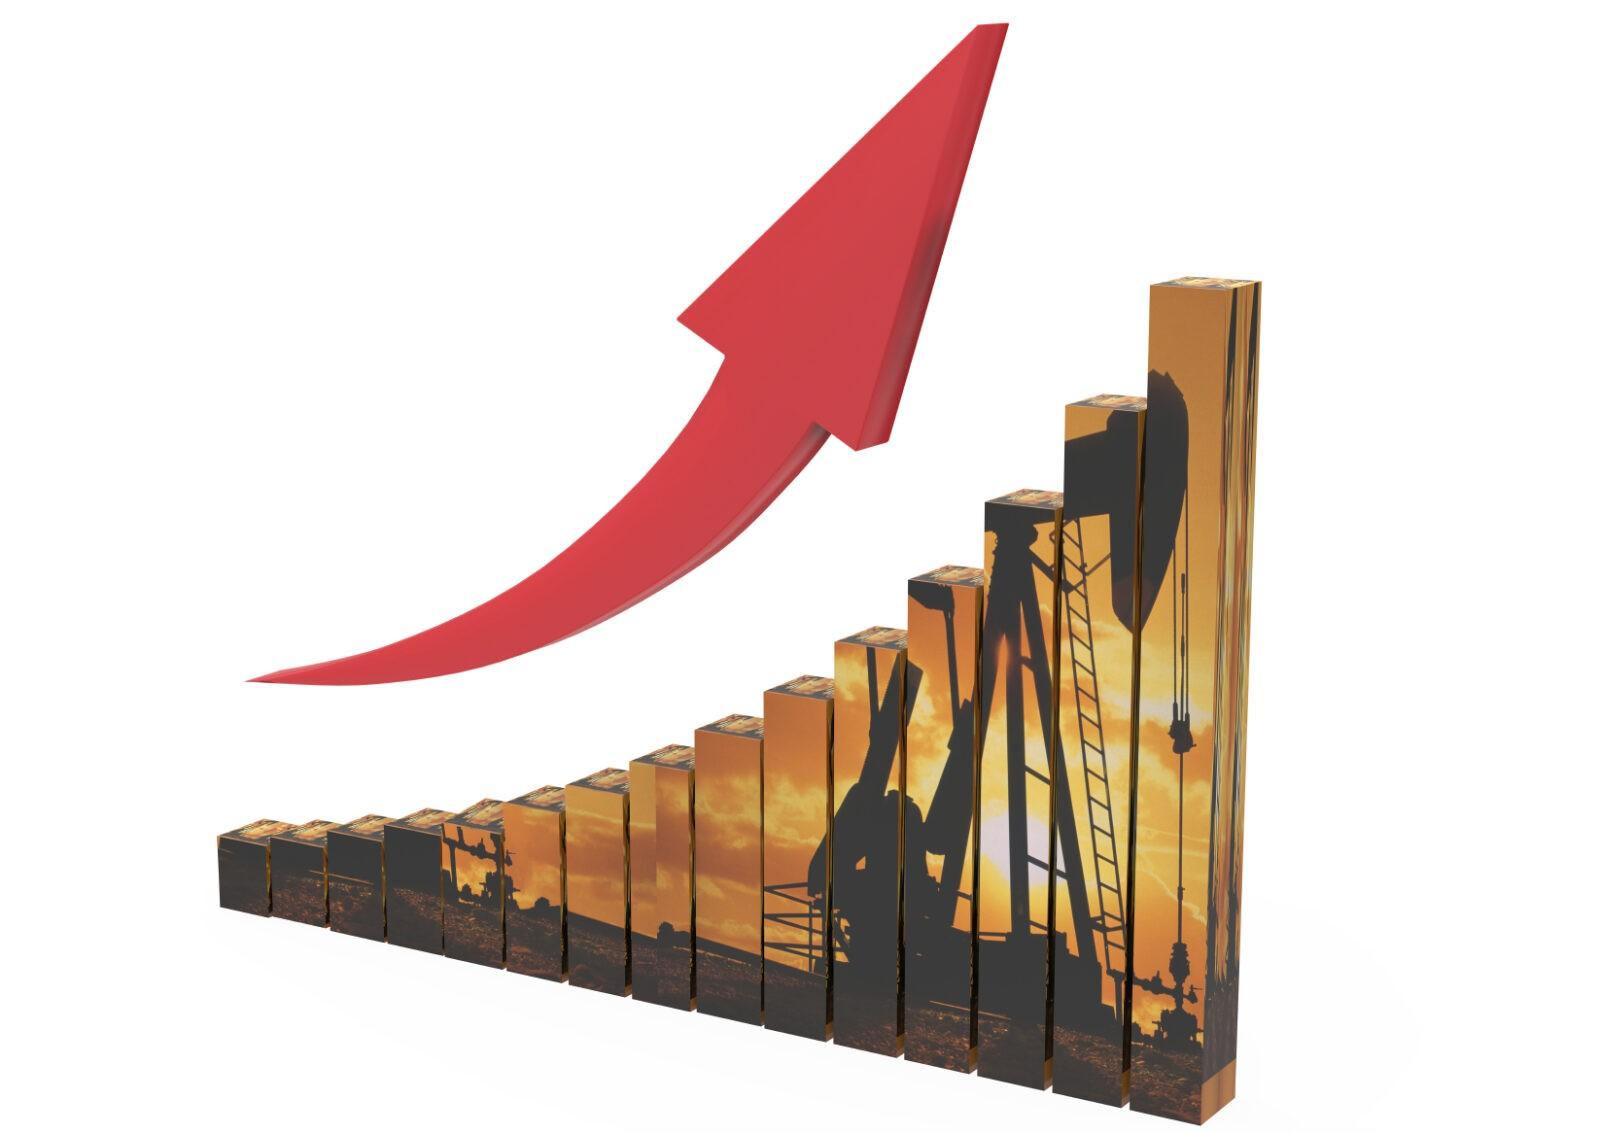 oil graph rising